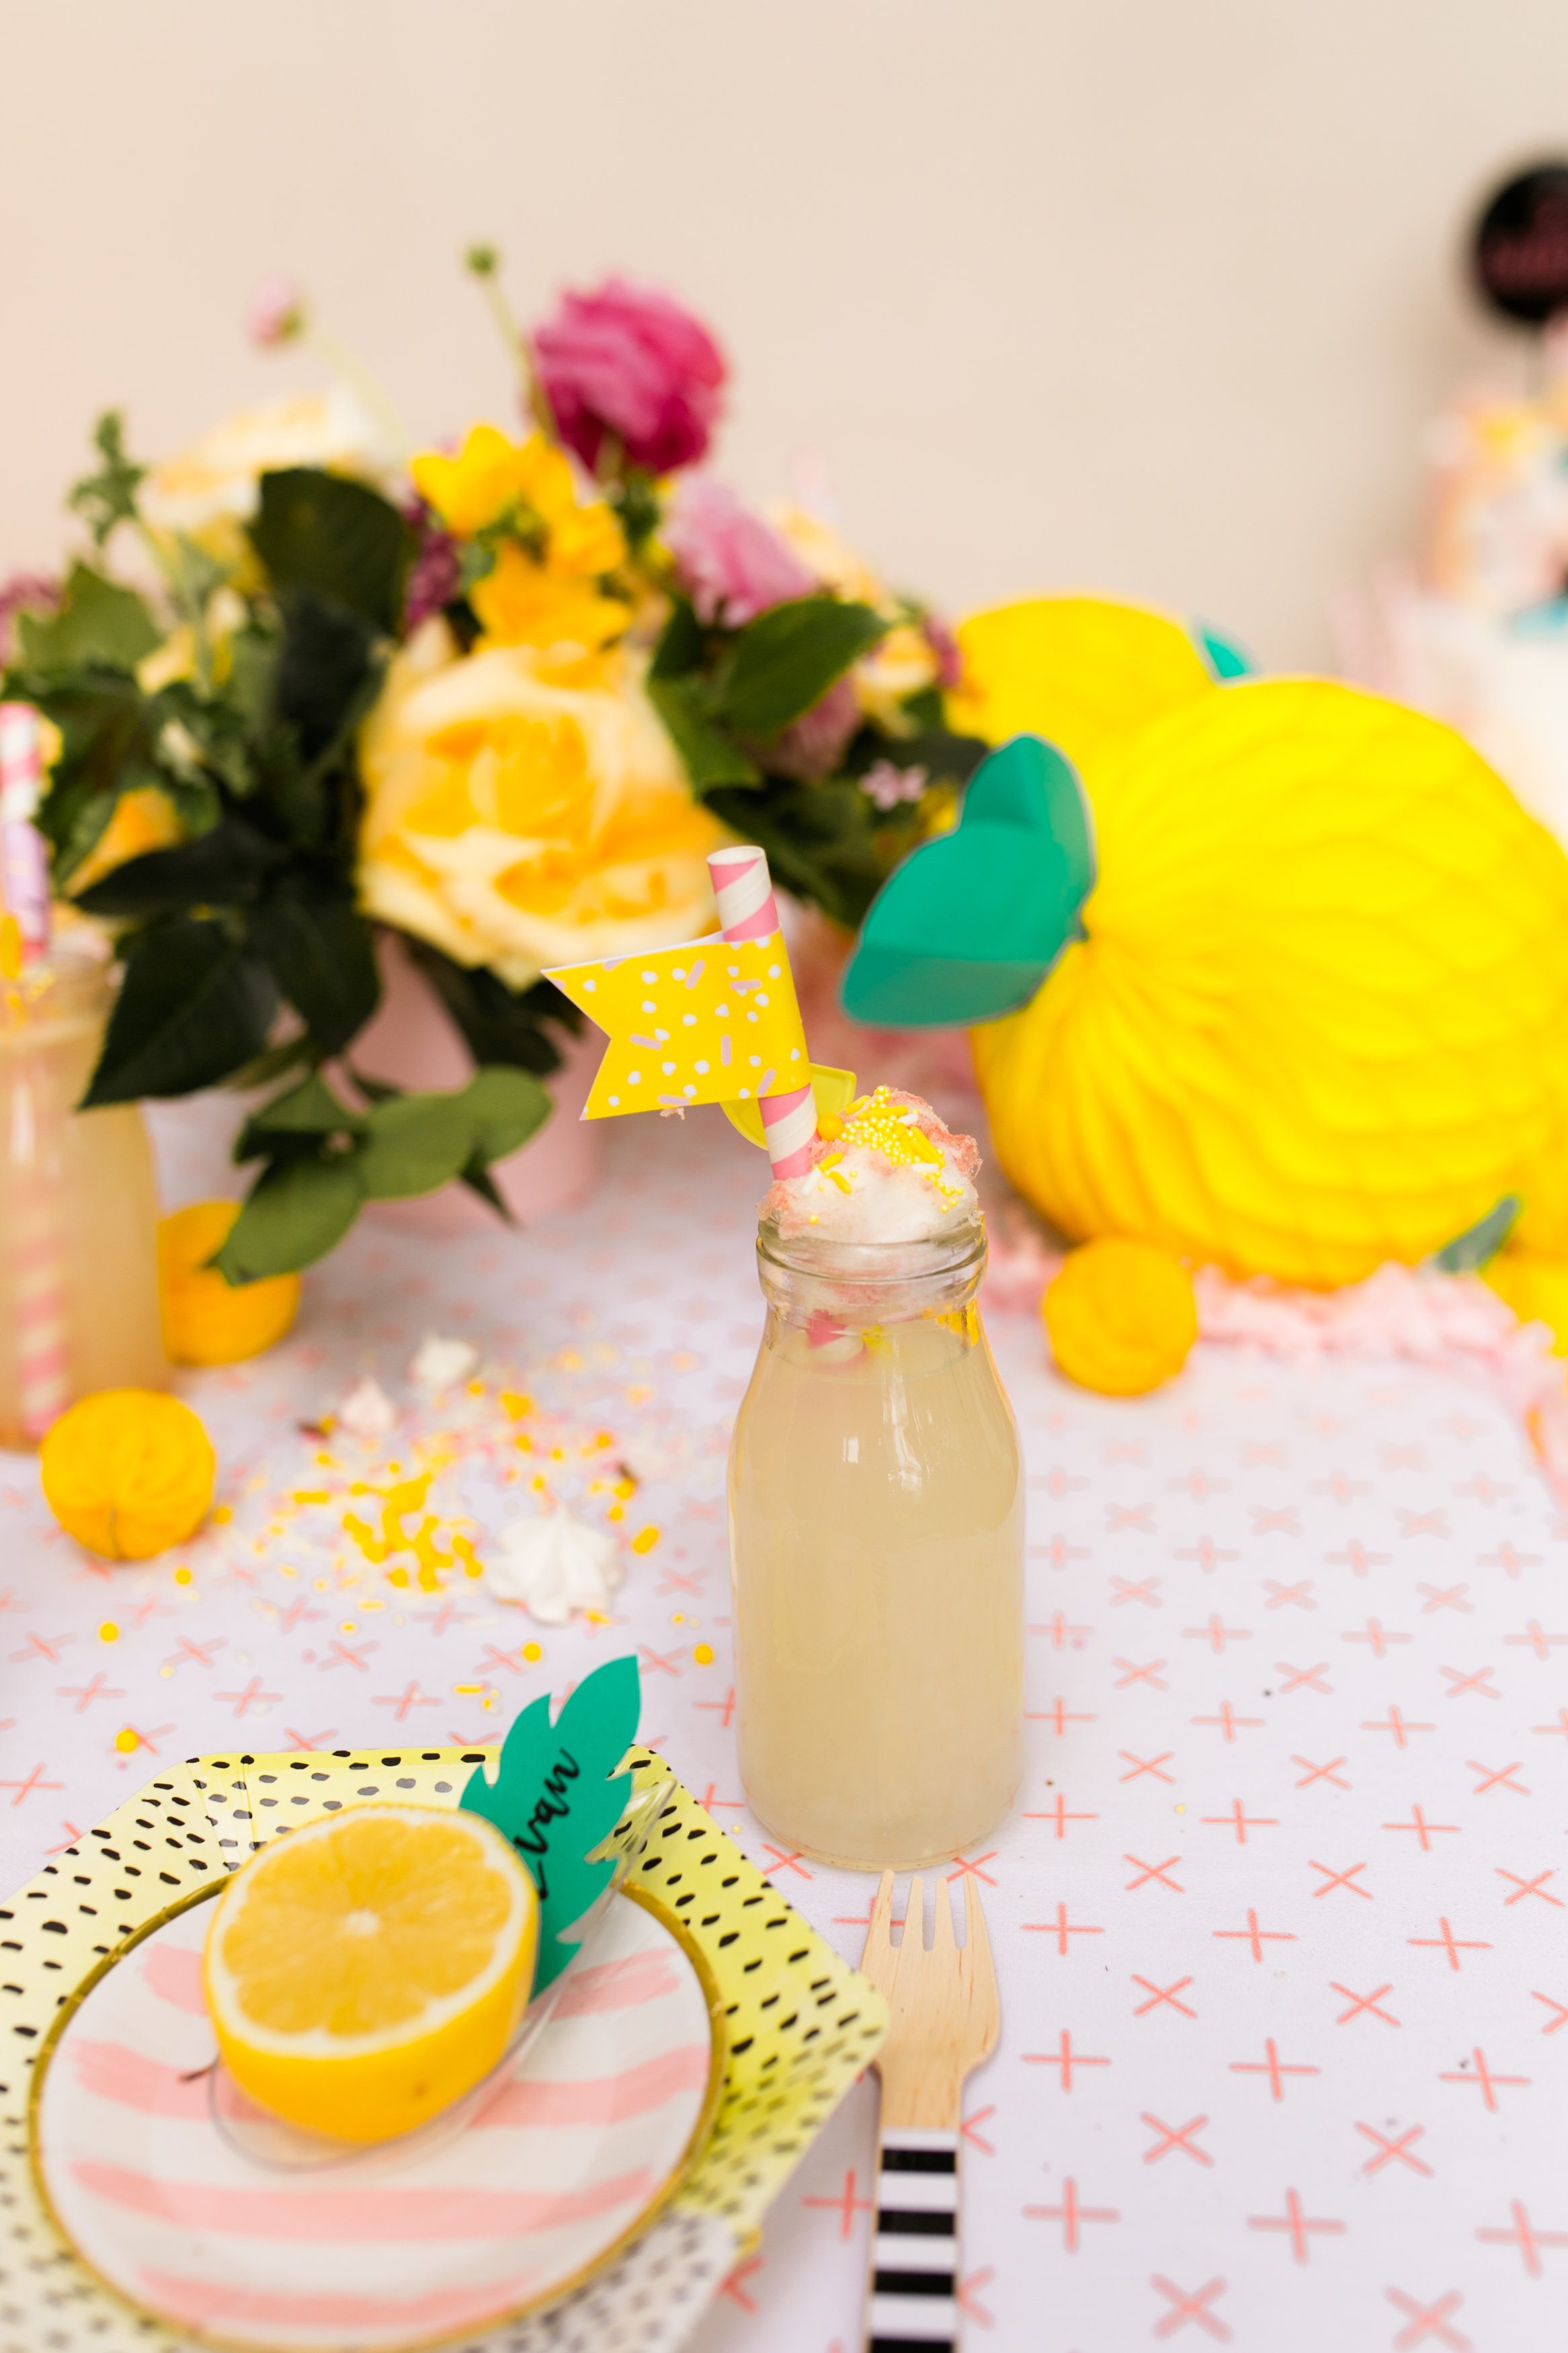 Lemonade Birthday Party -Tabletop Decor